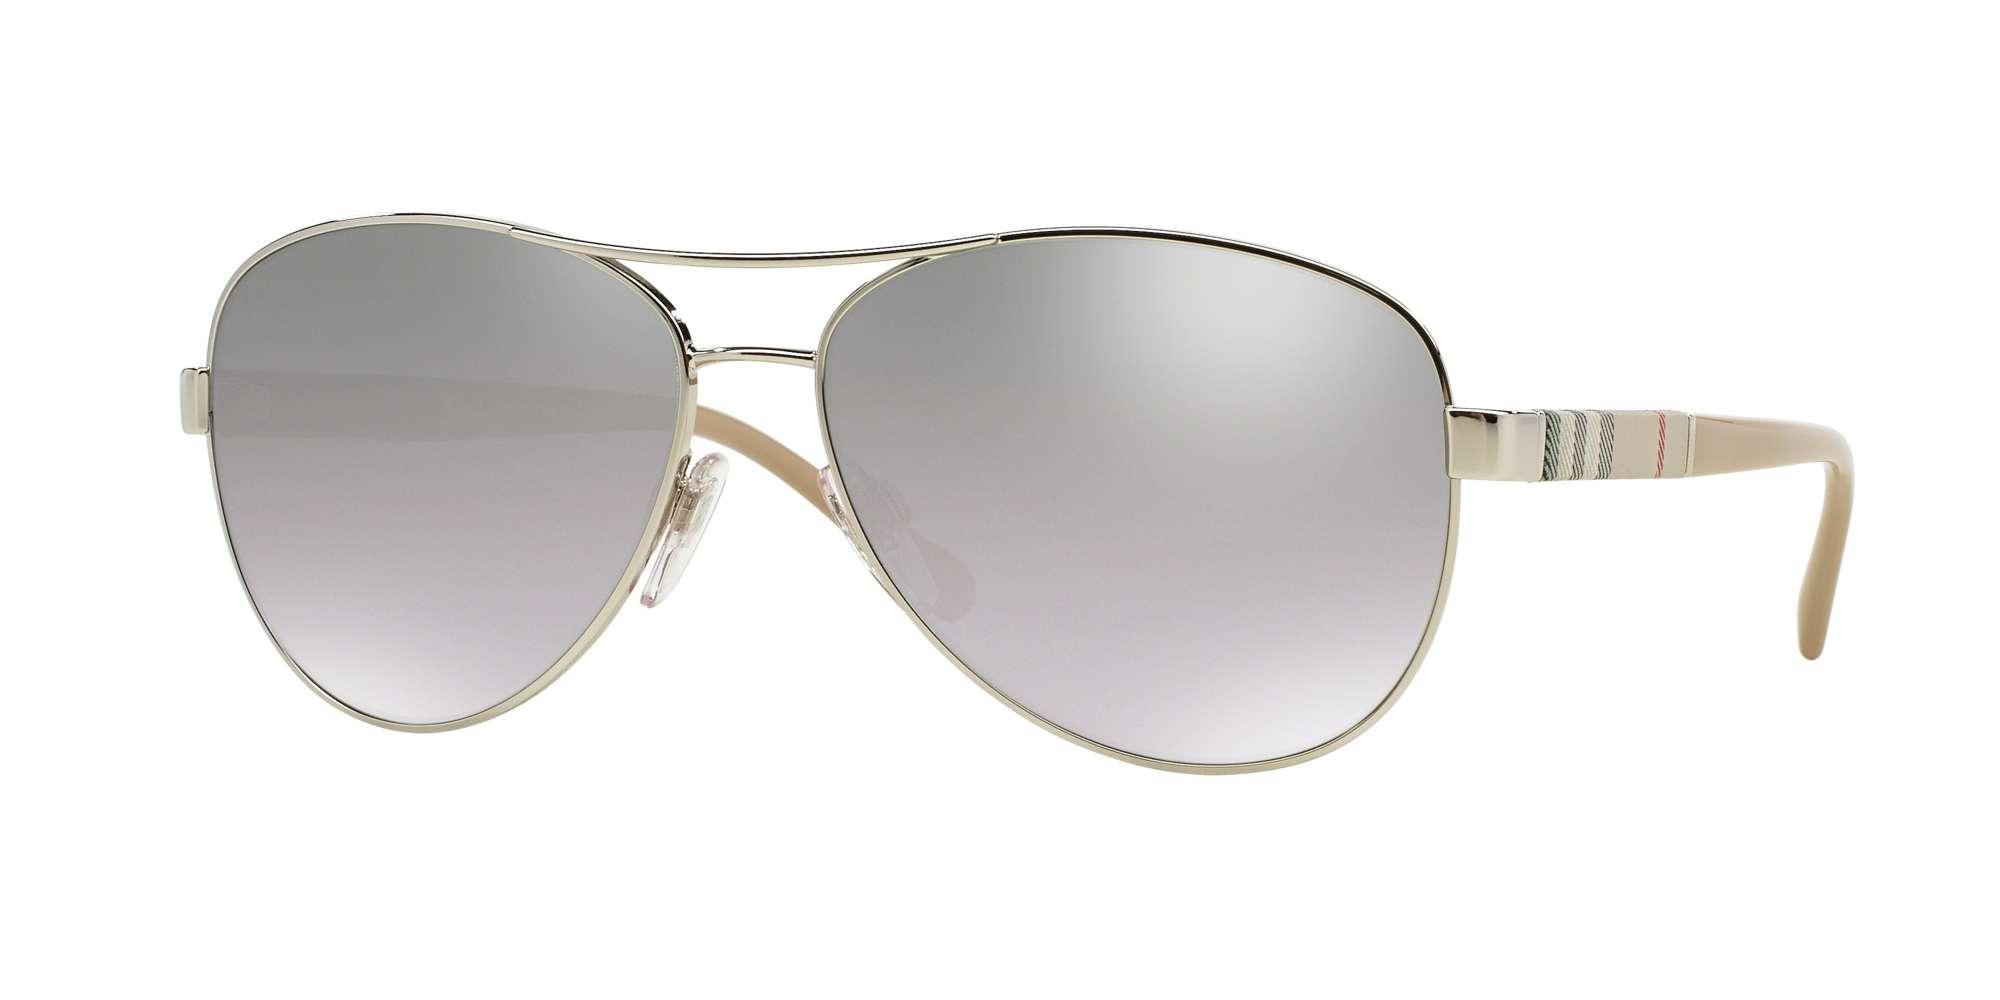 SILVER / LIGHT GREY MIRROR GRAD SILVER lenses